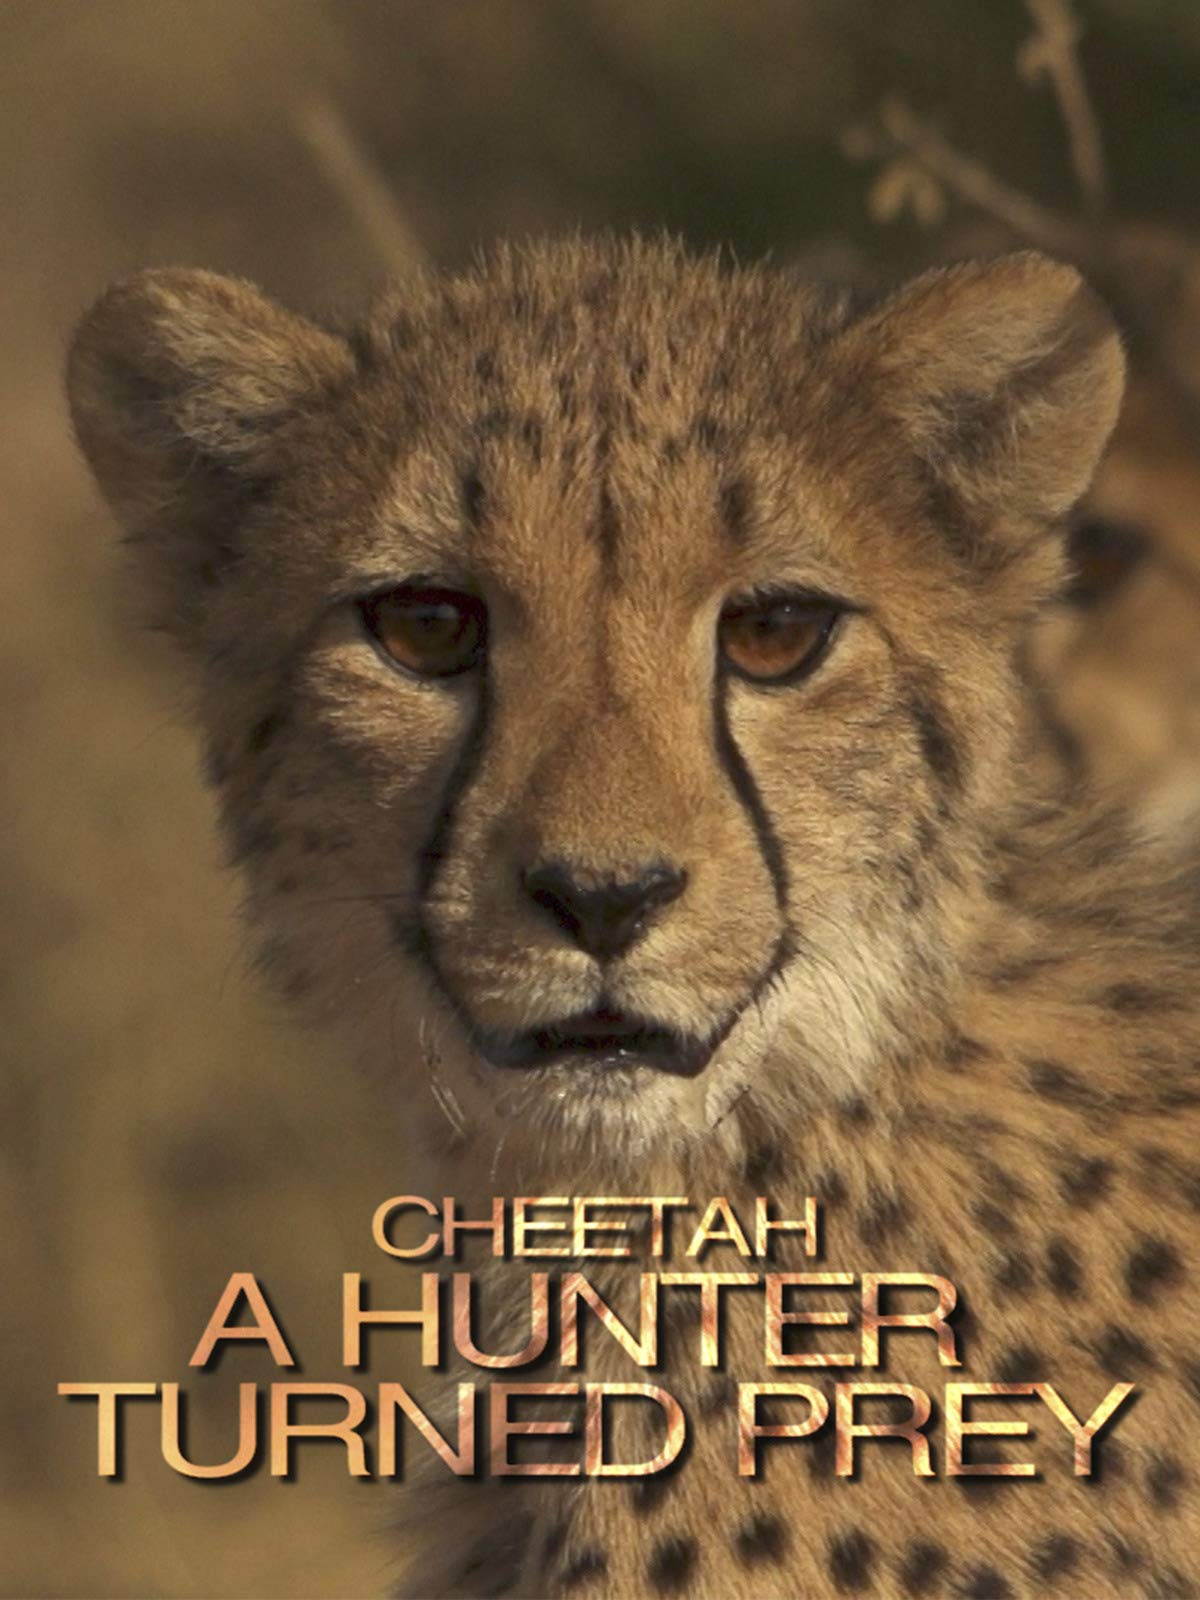 Cheetah, a hunter turned prey